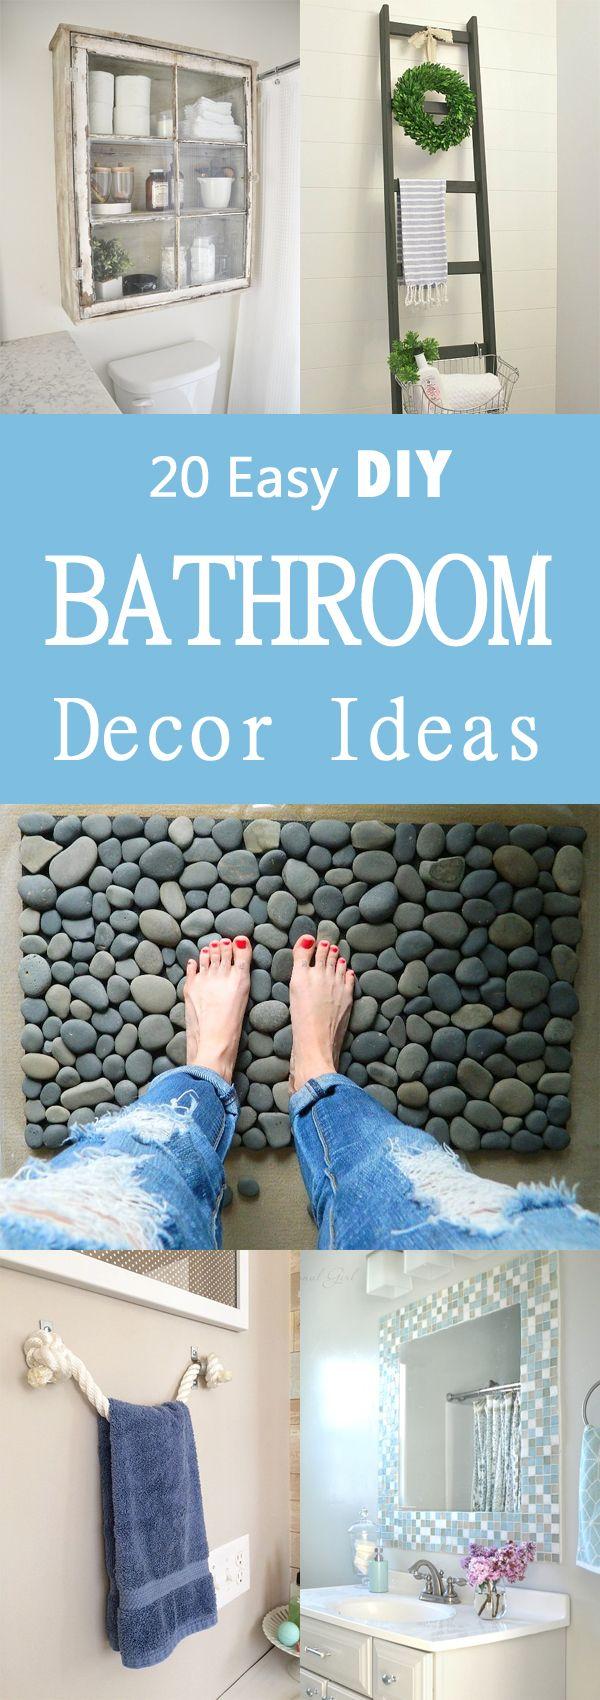 Diy bathroom decor - 20 Easy Diy Bathroom Decor Ideas